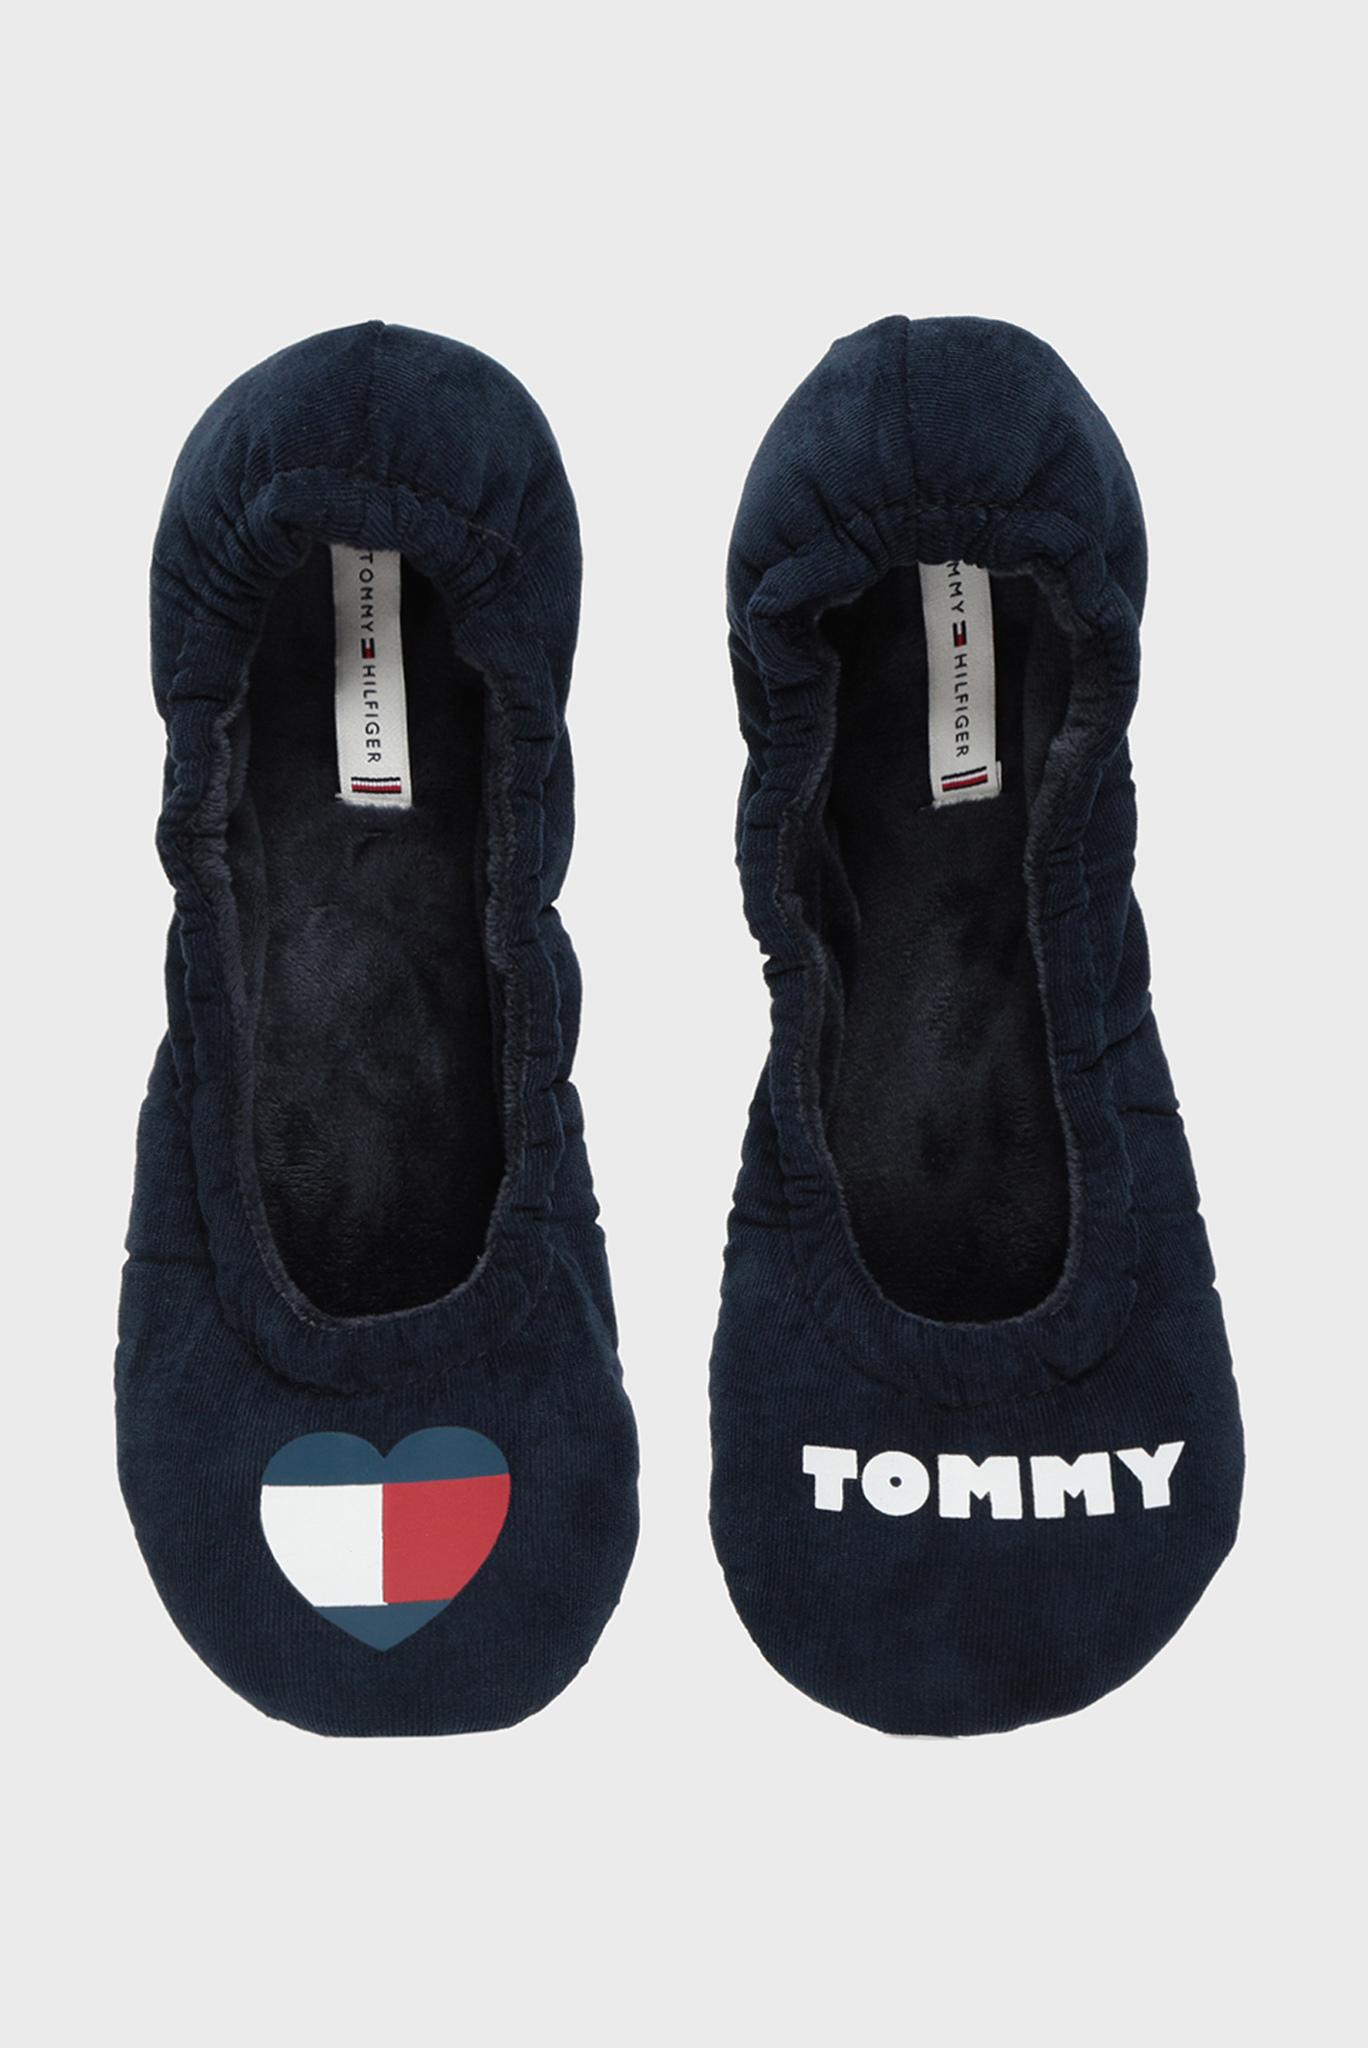 Женские темно-синие вельветовые домашние тапочки TOMMY HEART TRAVEL PACK Tommy Hilfiger